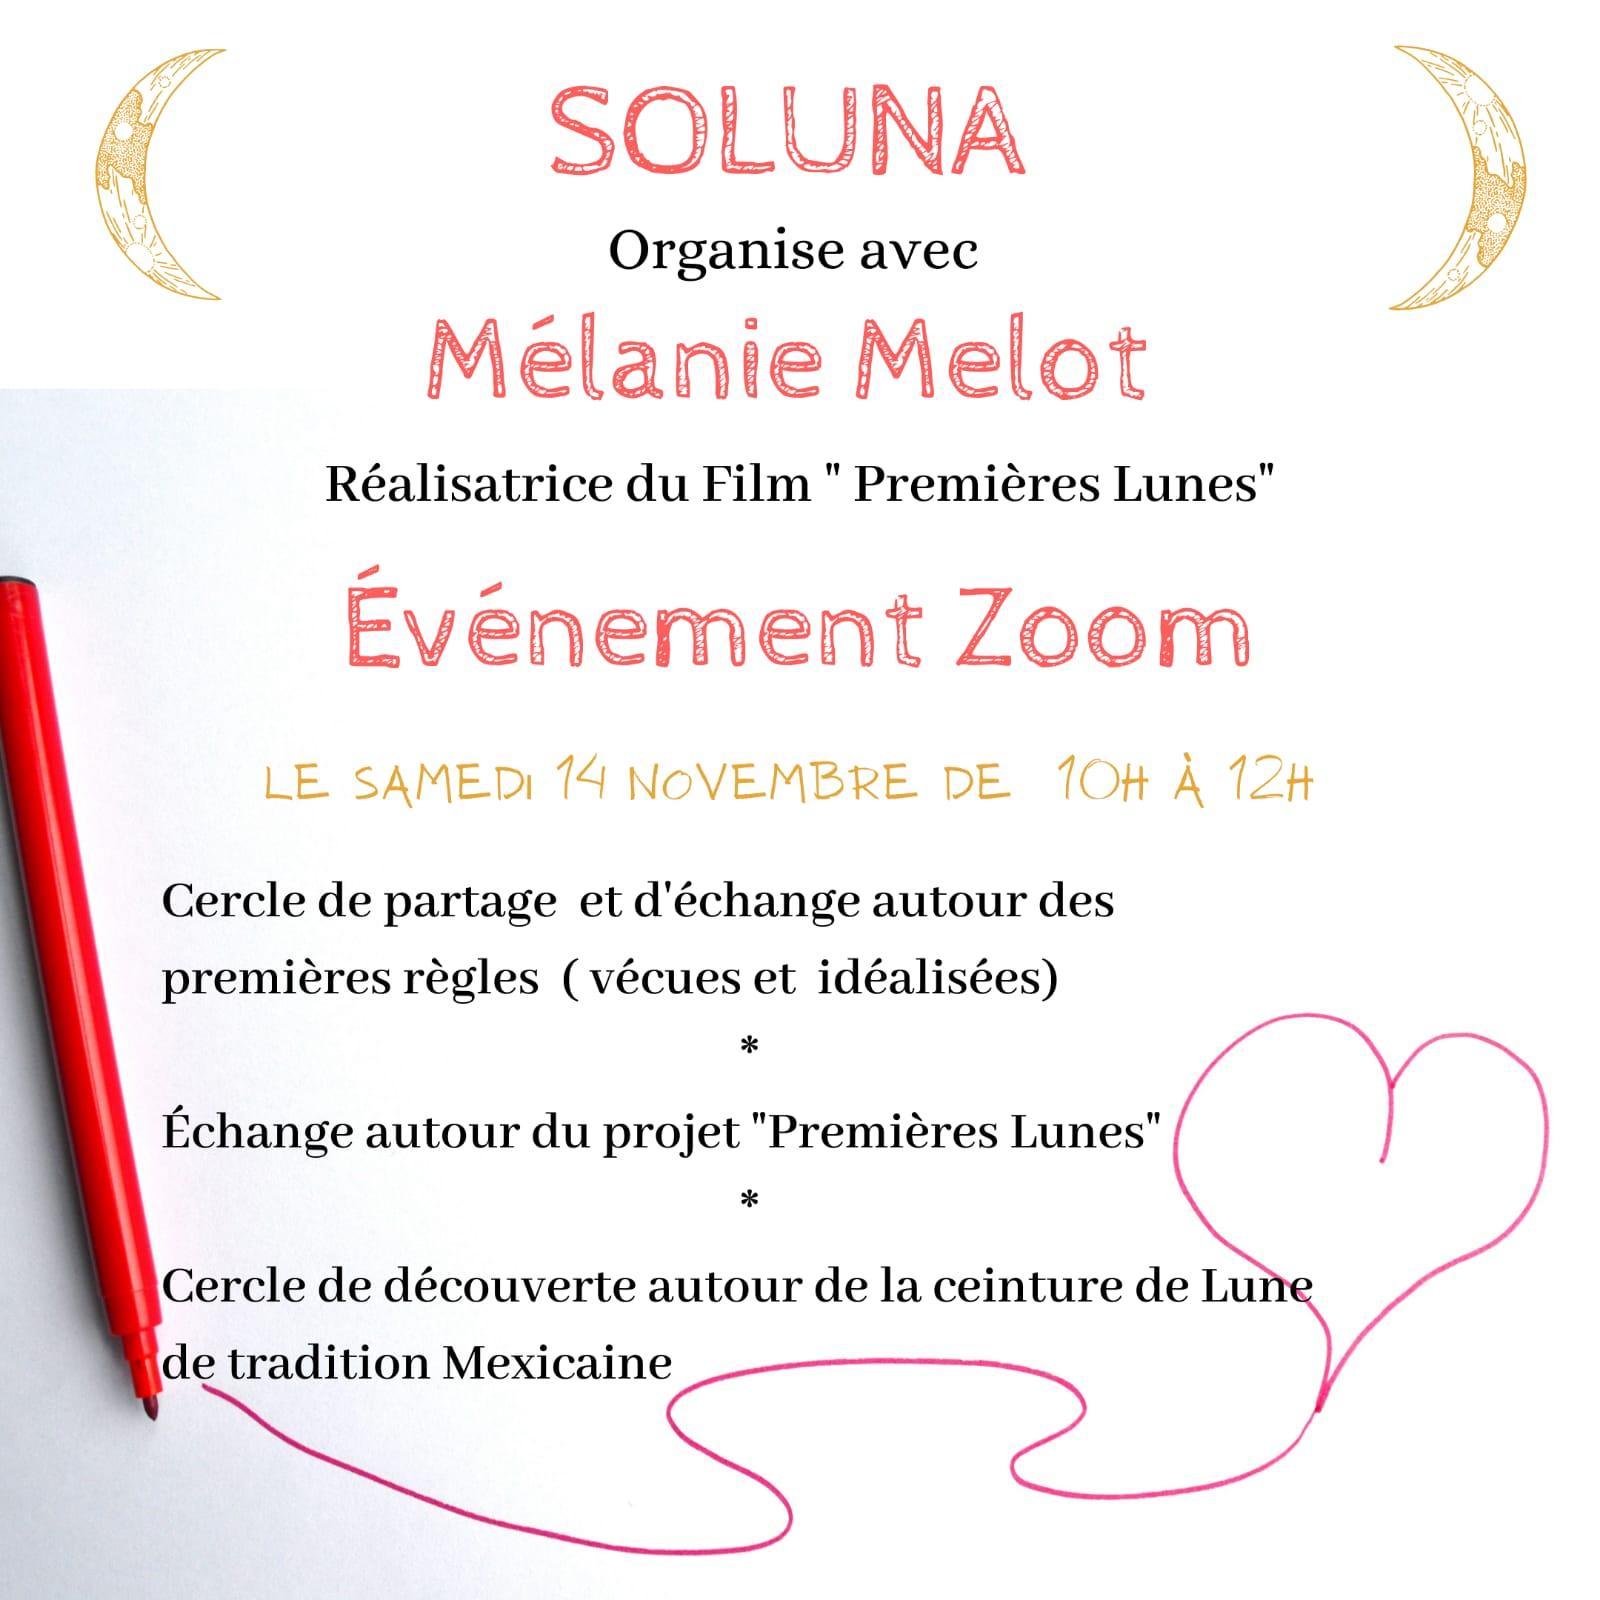 Melanie Melot soluna